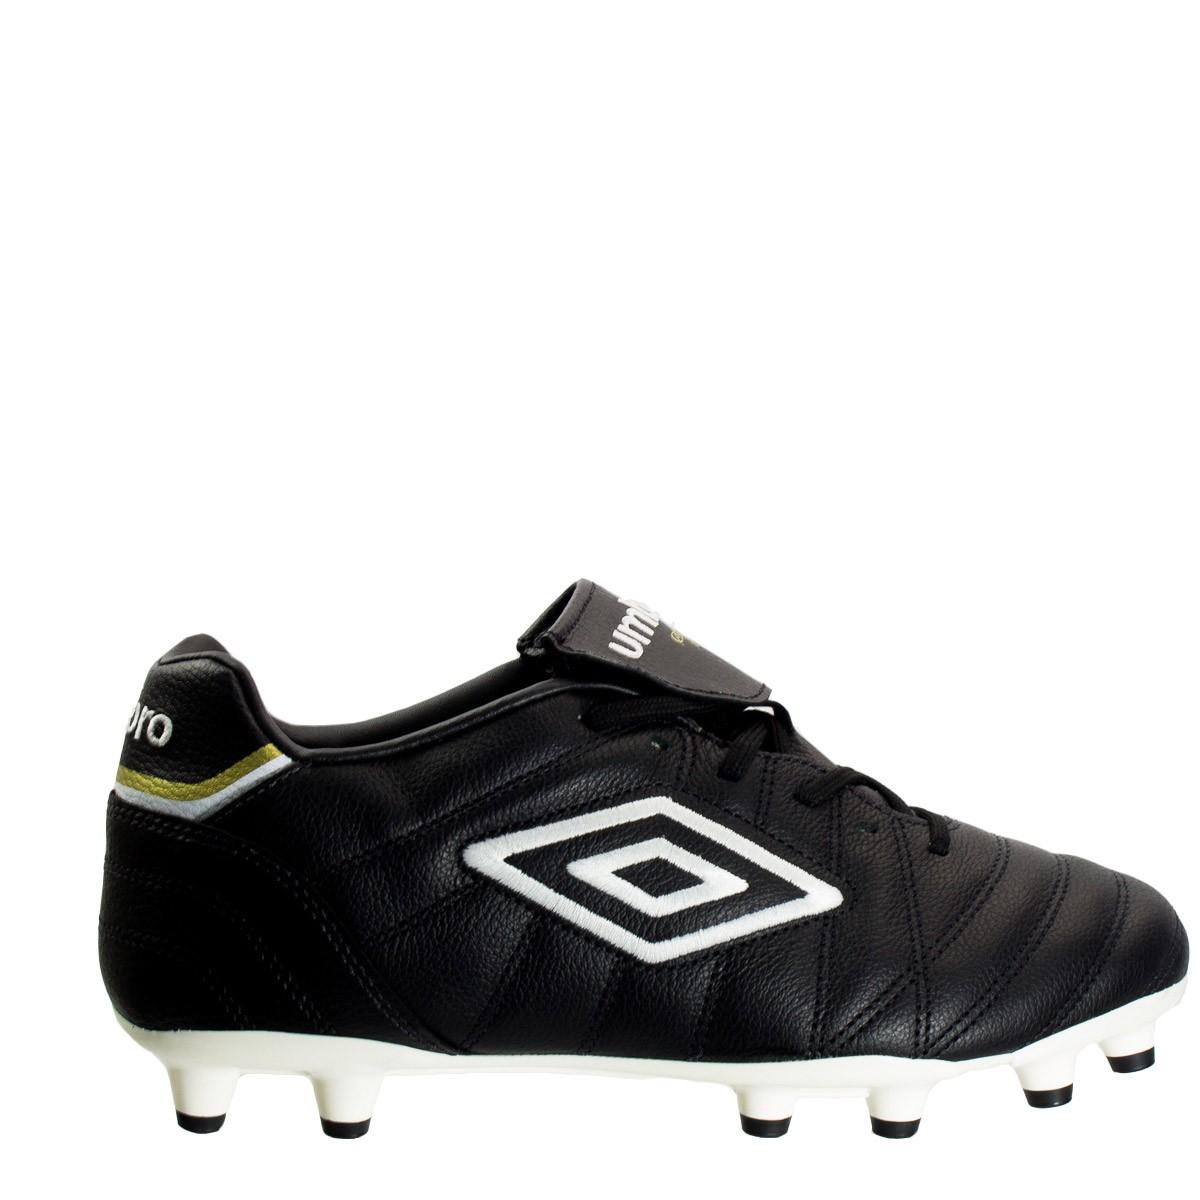 19c8d8b1d4 Bizz Store - Chuteira Futebol de Campo Umbro Speciali Premier